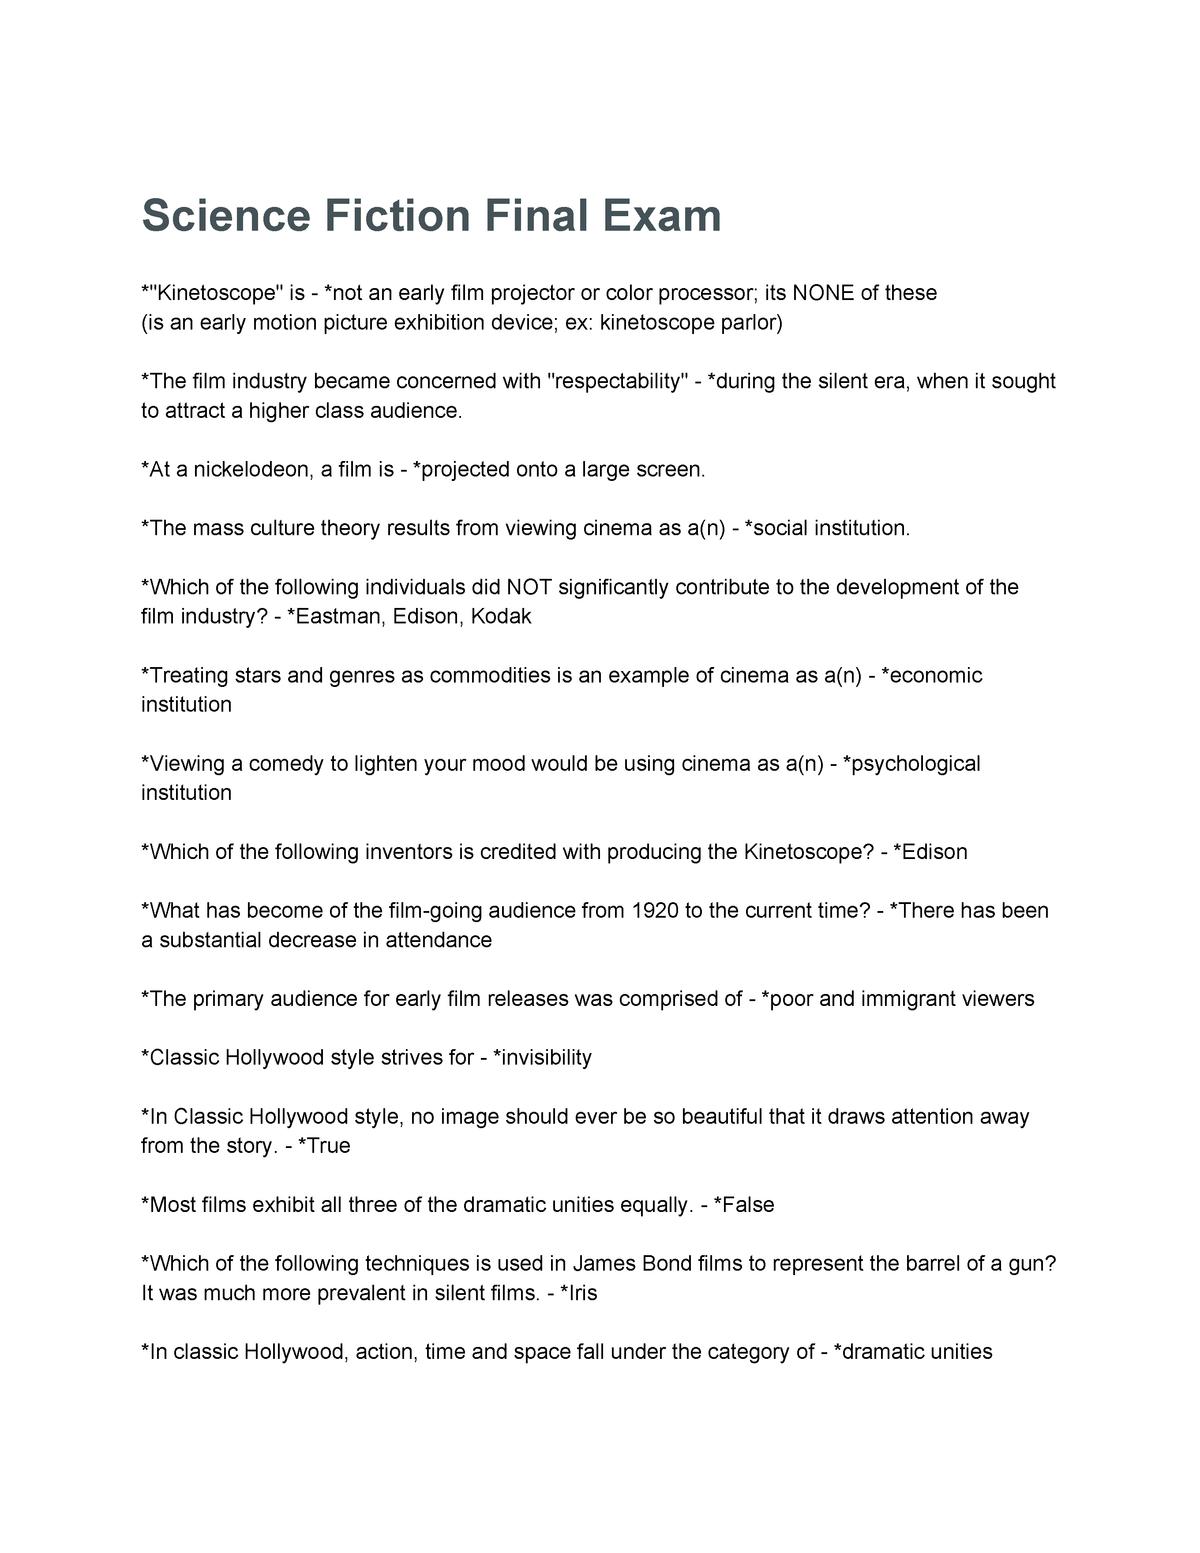 Exam 2017 - ENGL 3840: Science Fiction - StuDocu